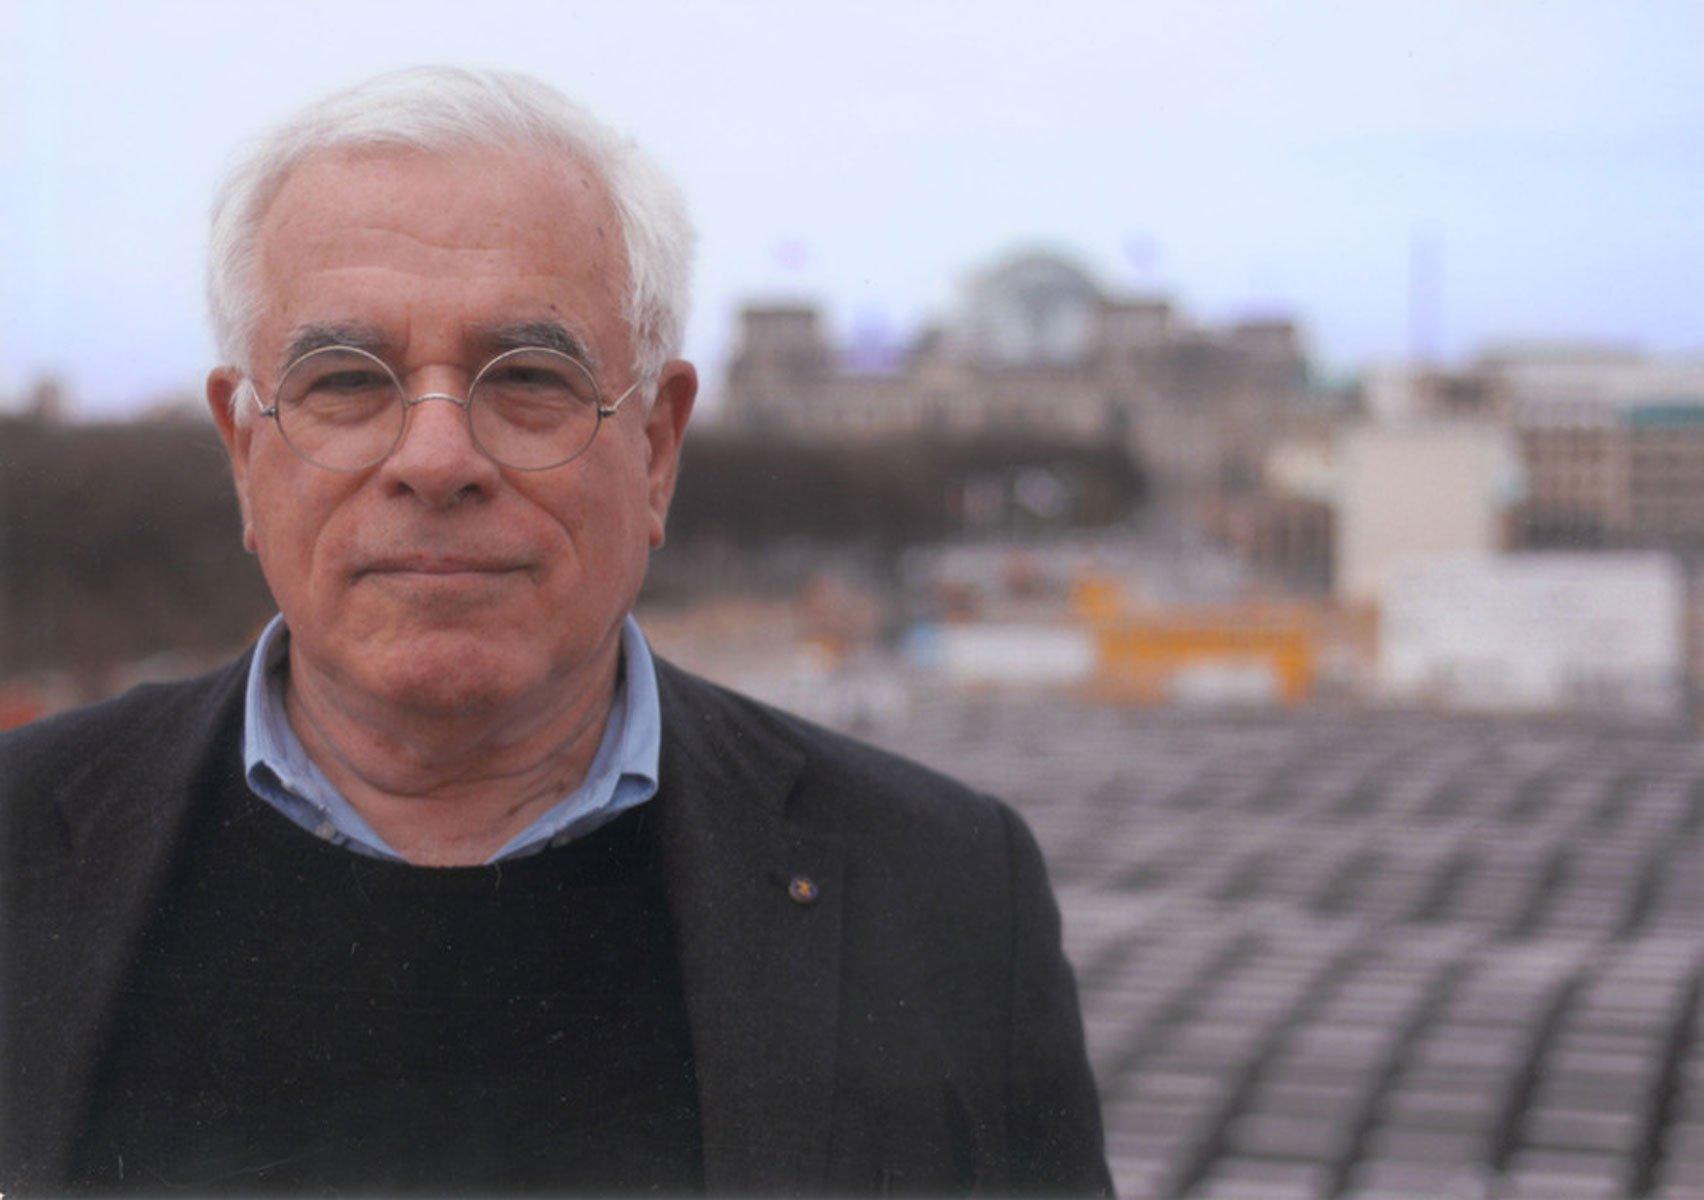 Berlin Holocaust memorial wouldn't be built today, says Peter Eisenman